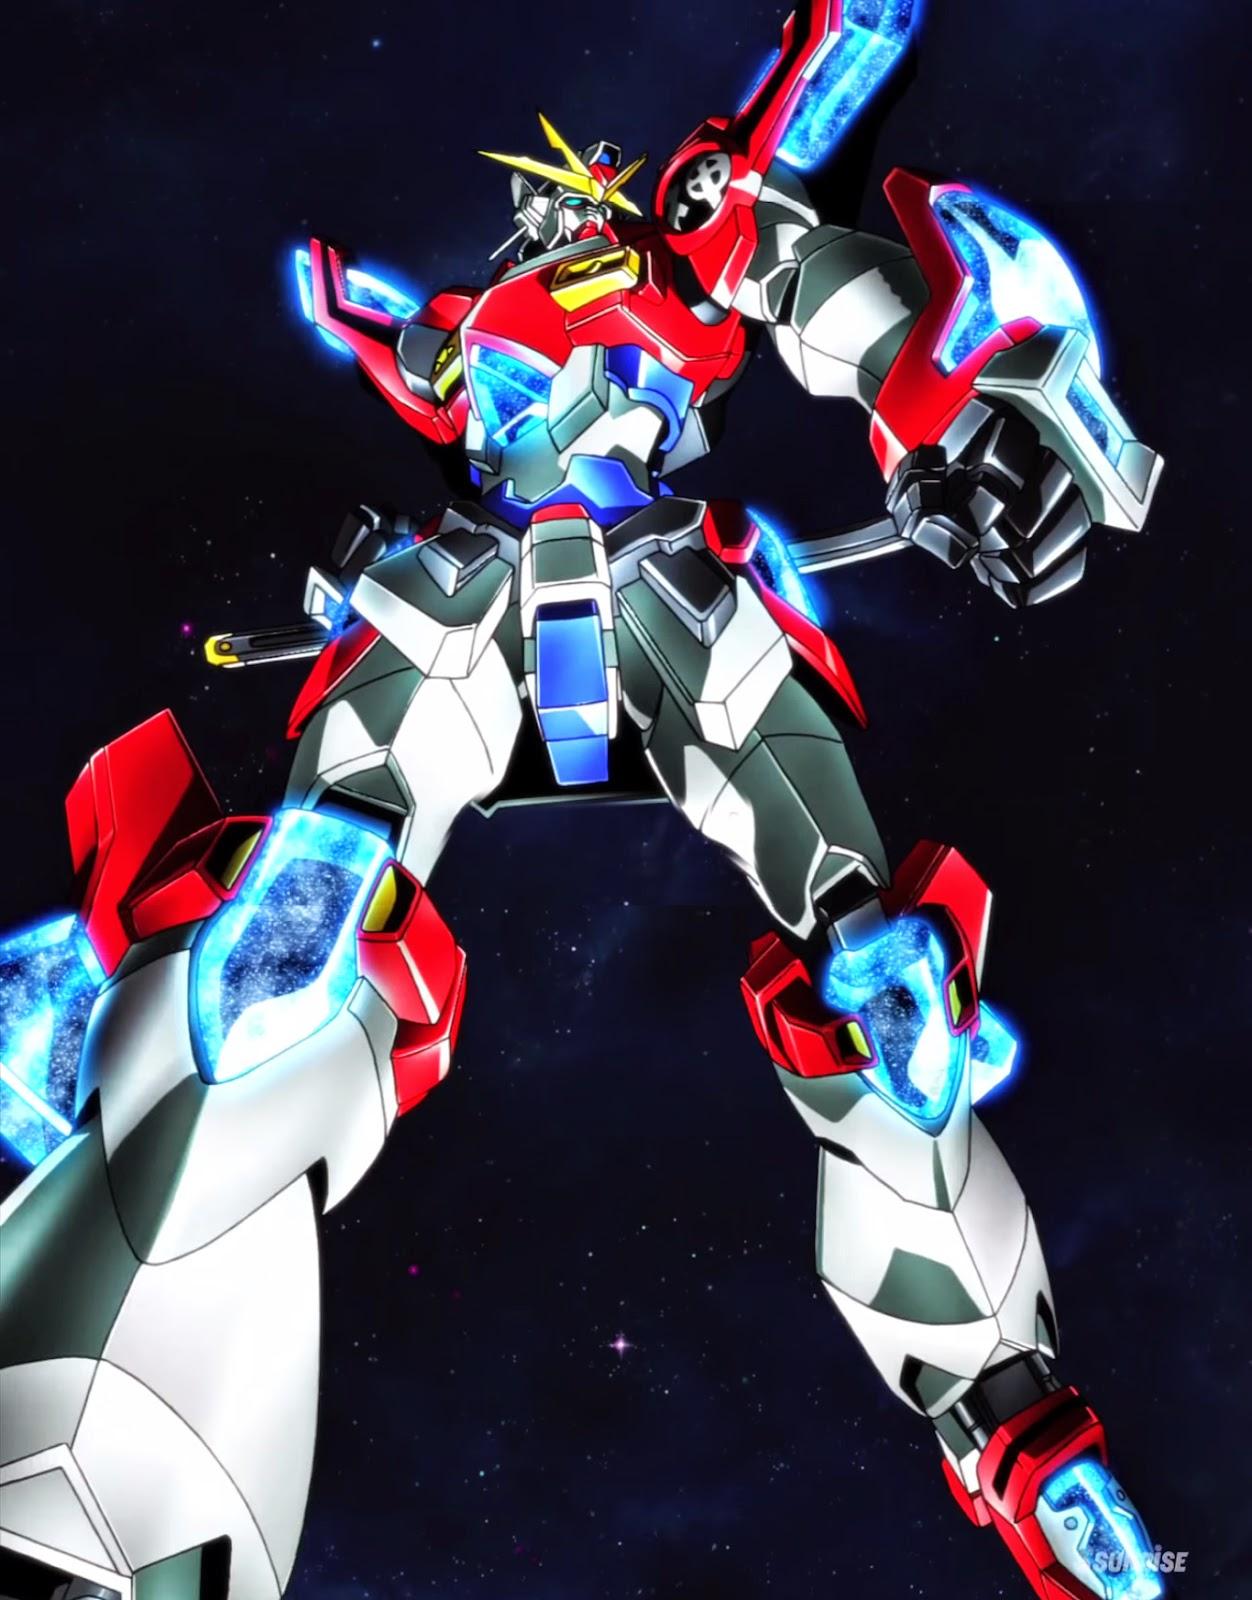 Gundam build fighters try panorama vertical wallpaper for Domon gundam build fighters try